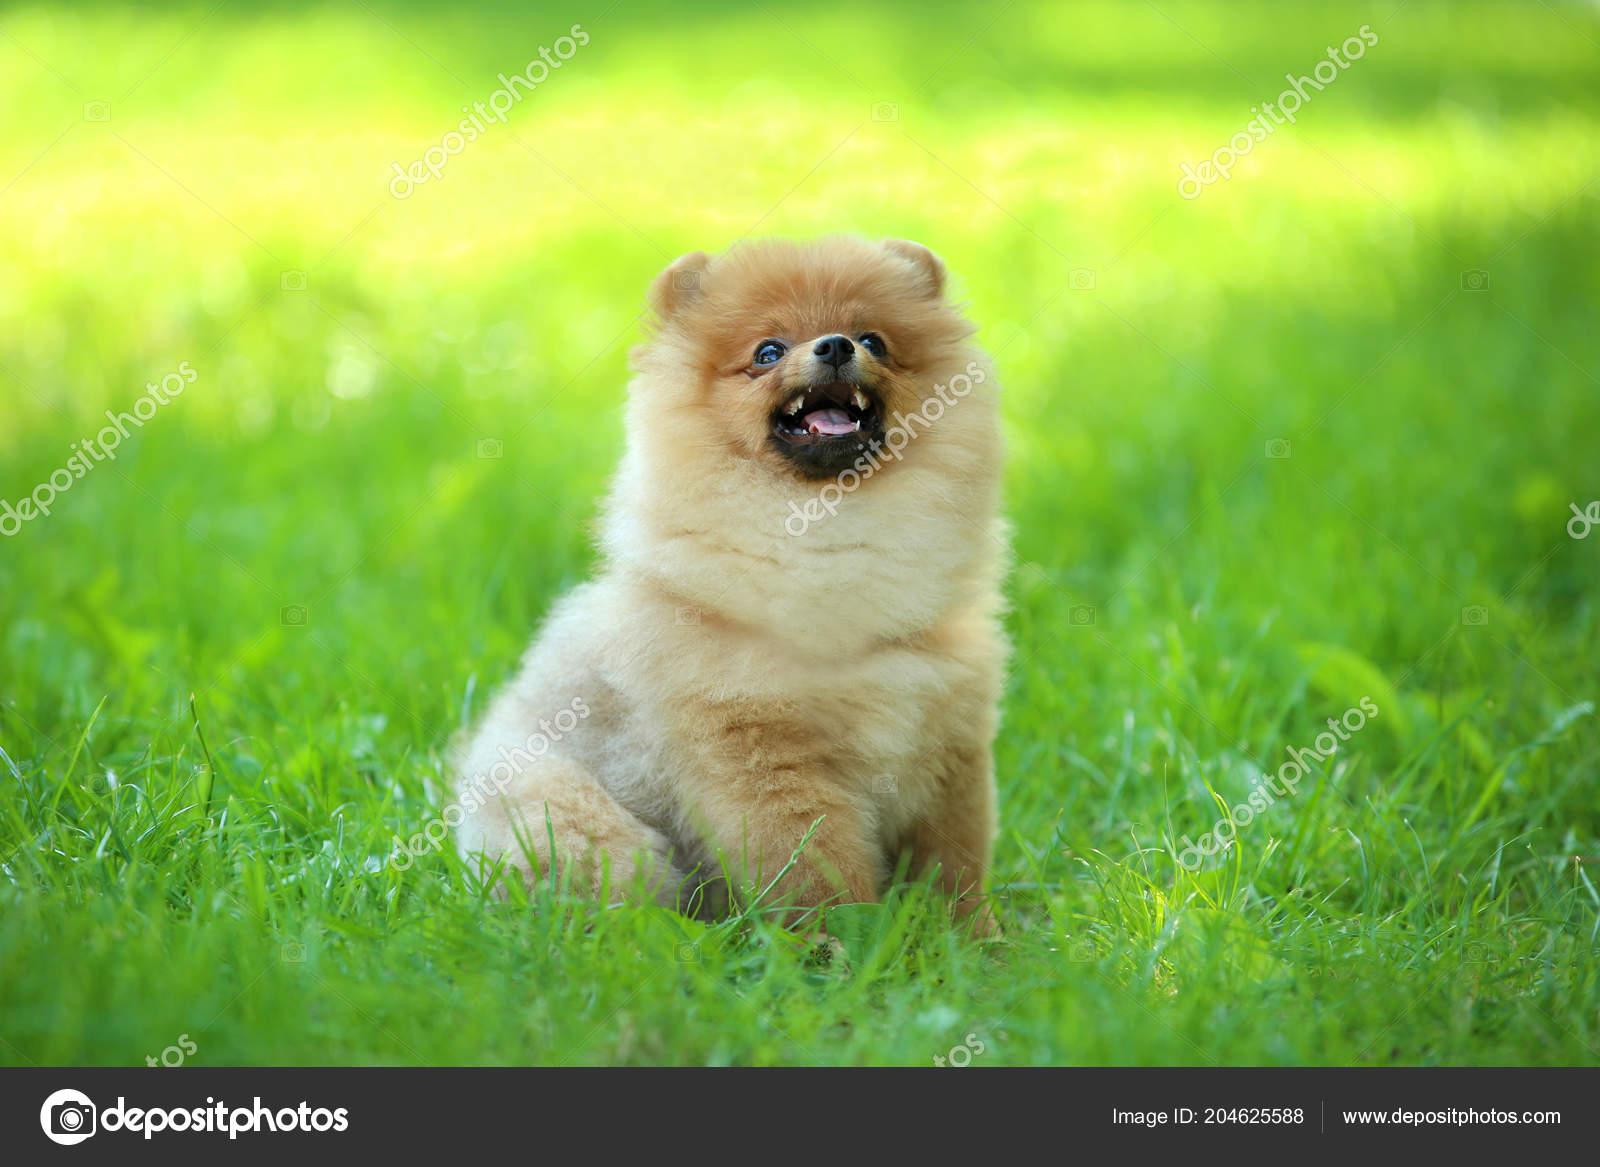 Pomeranian Dog Sitting Green Grass Stock Photo C 5seconds 204625588